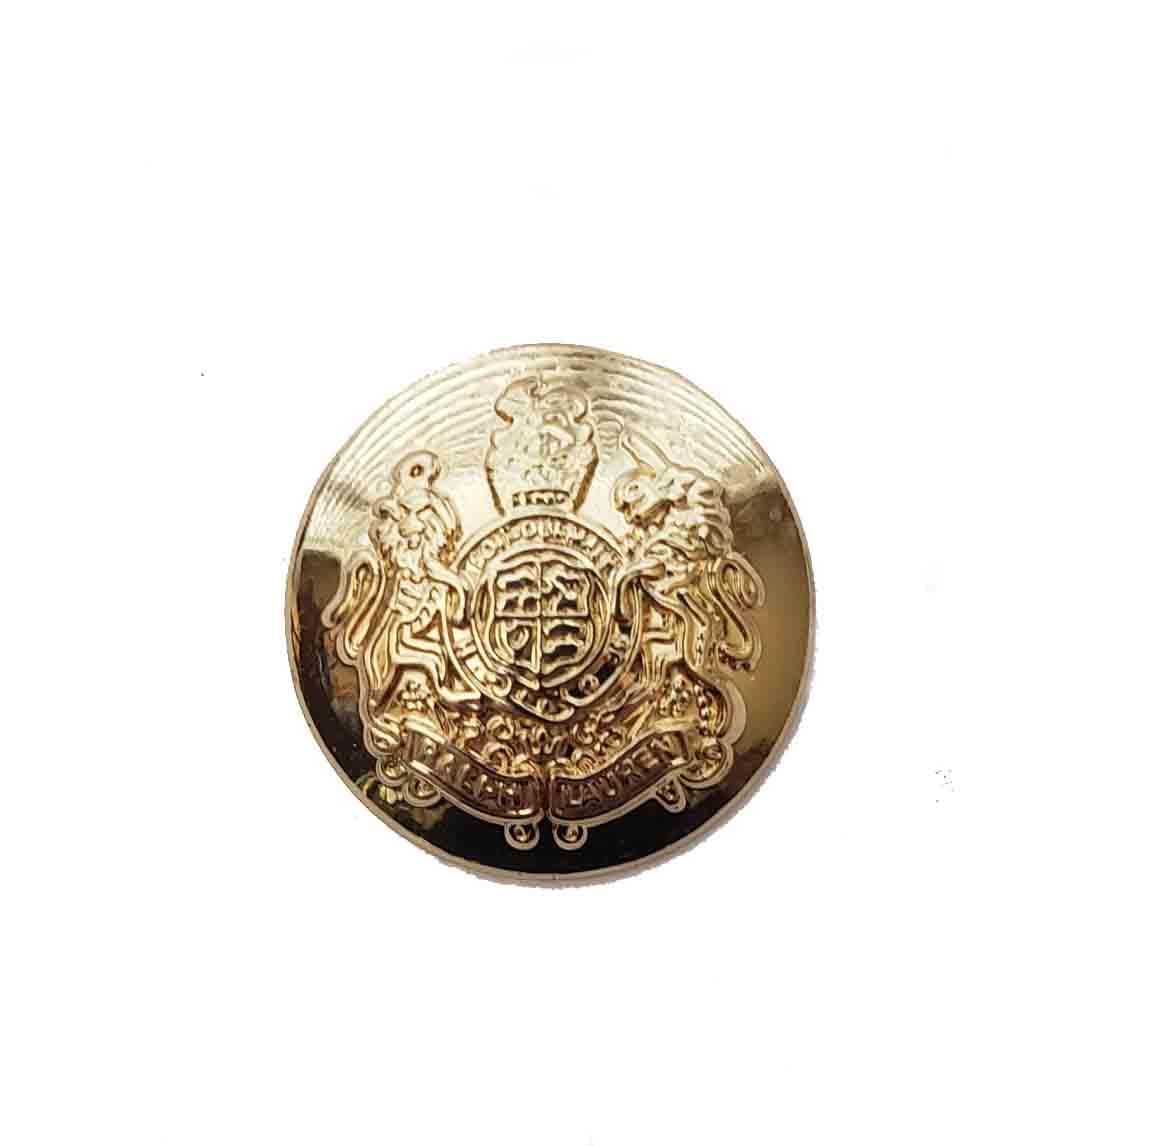 One Ralph Lauren Dome Gold Brass Replacement Blazer Button Lion Unicorn 7/8